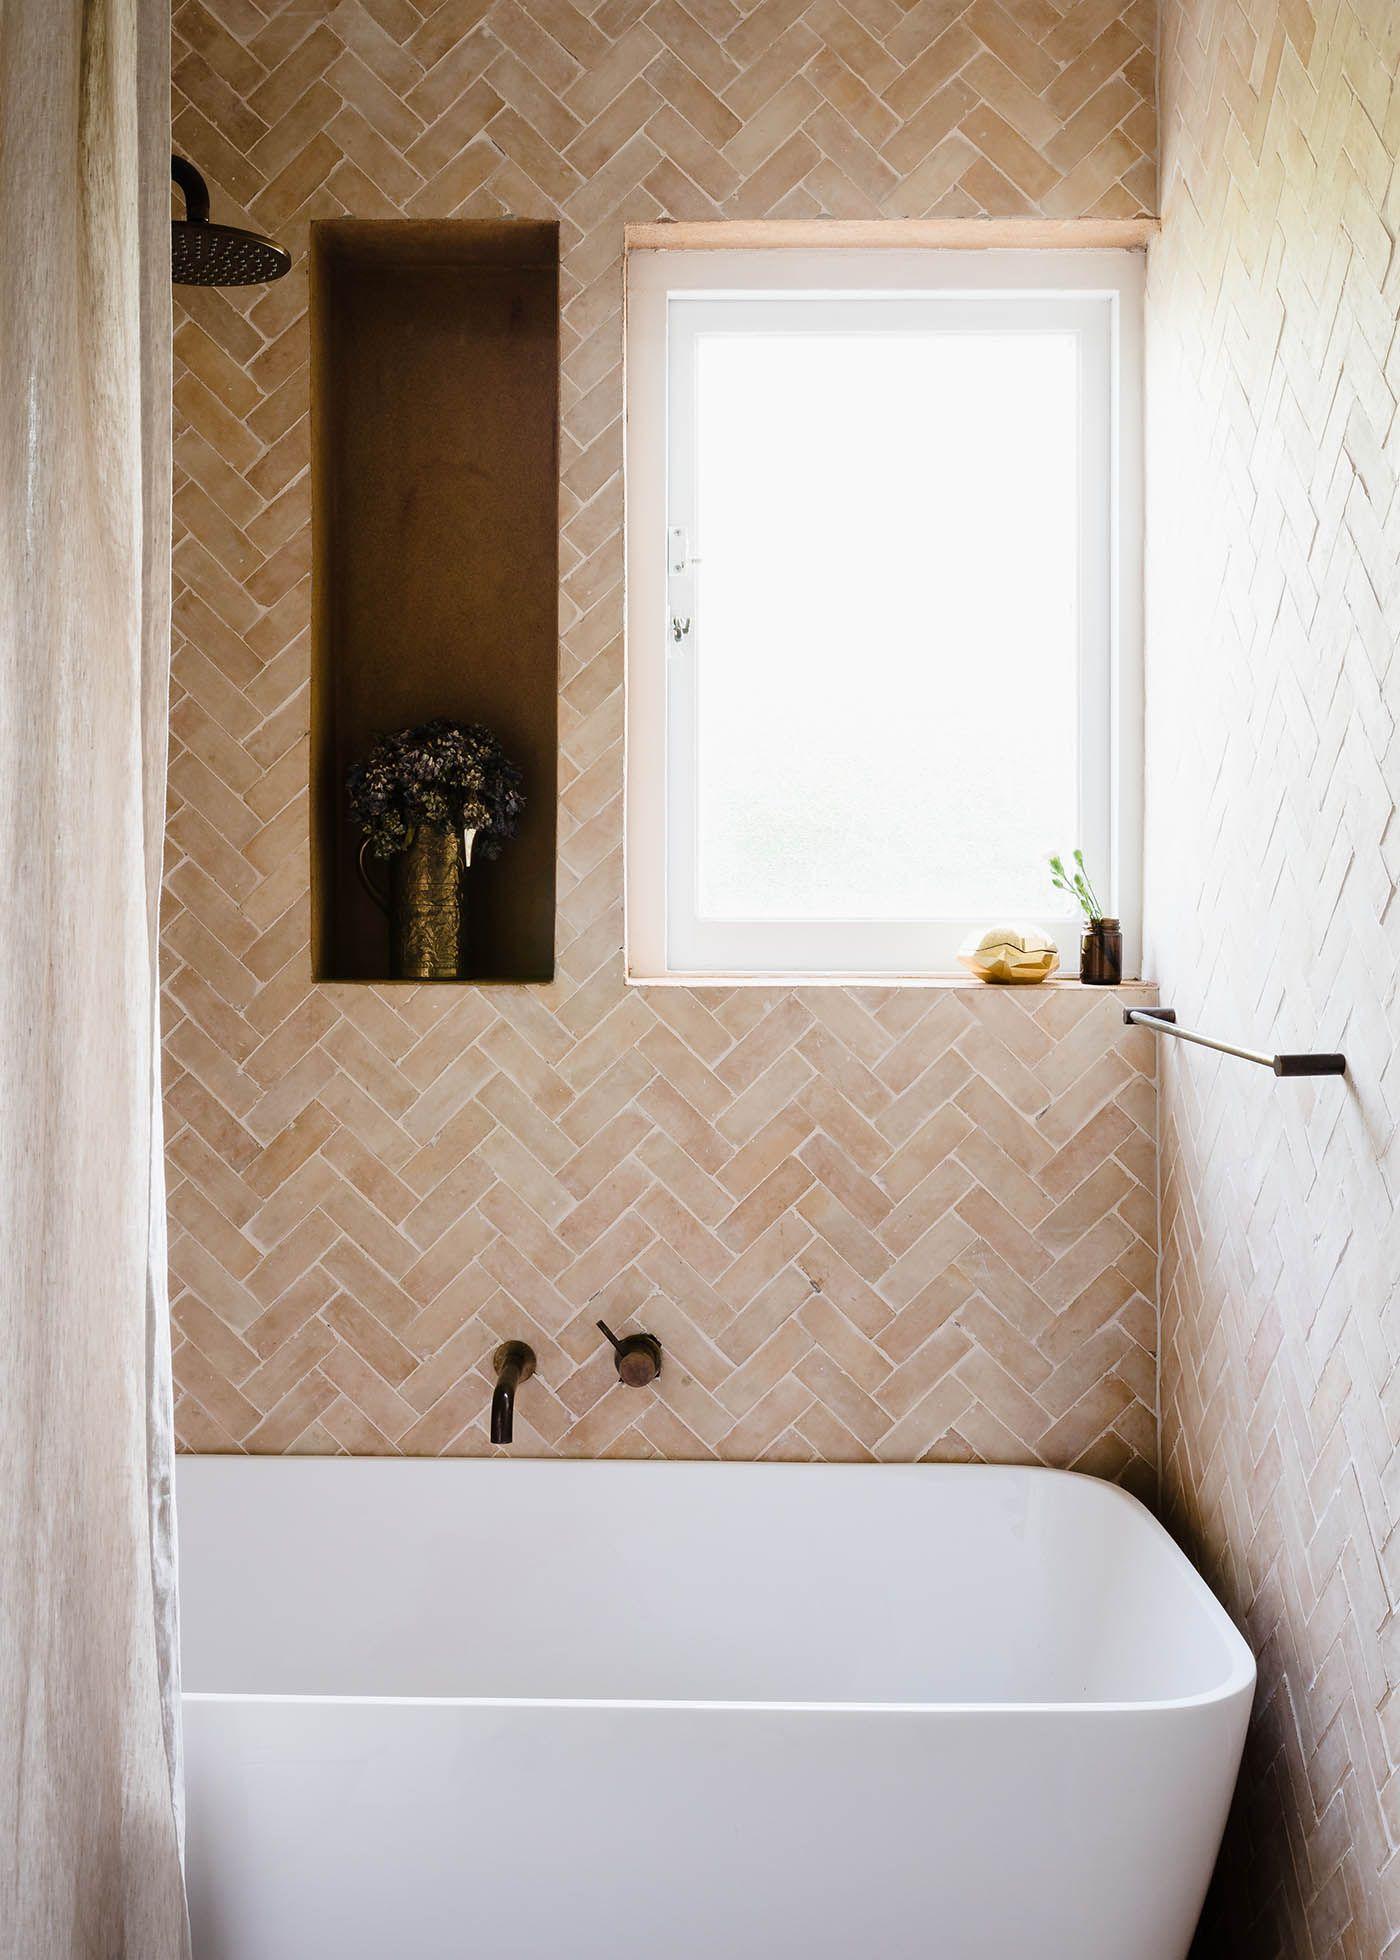 Gabbe Interior Tilesofezra Georgia Ezra Home Feature Shower Mosaic Magnificent Mosaic Feature Tiles Bathroom Inspiration